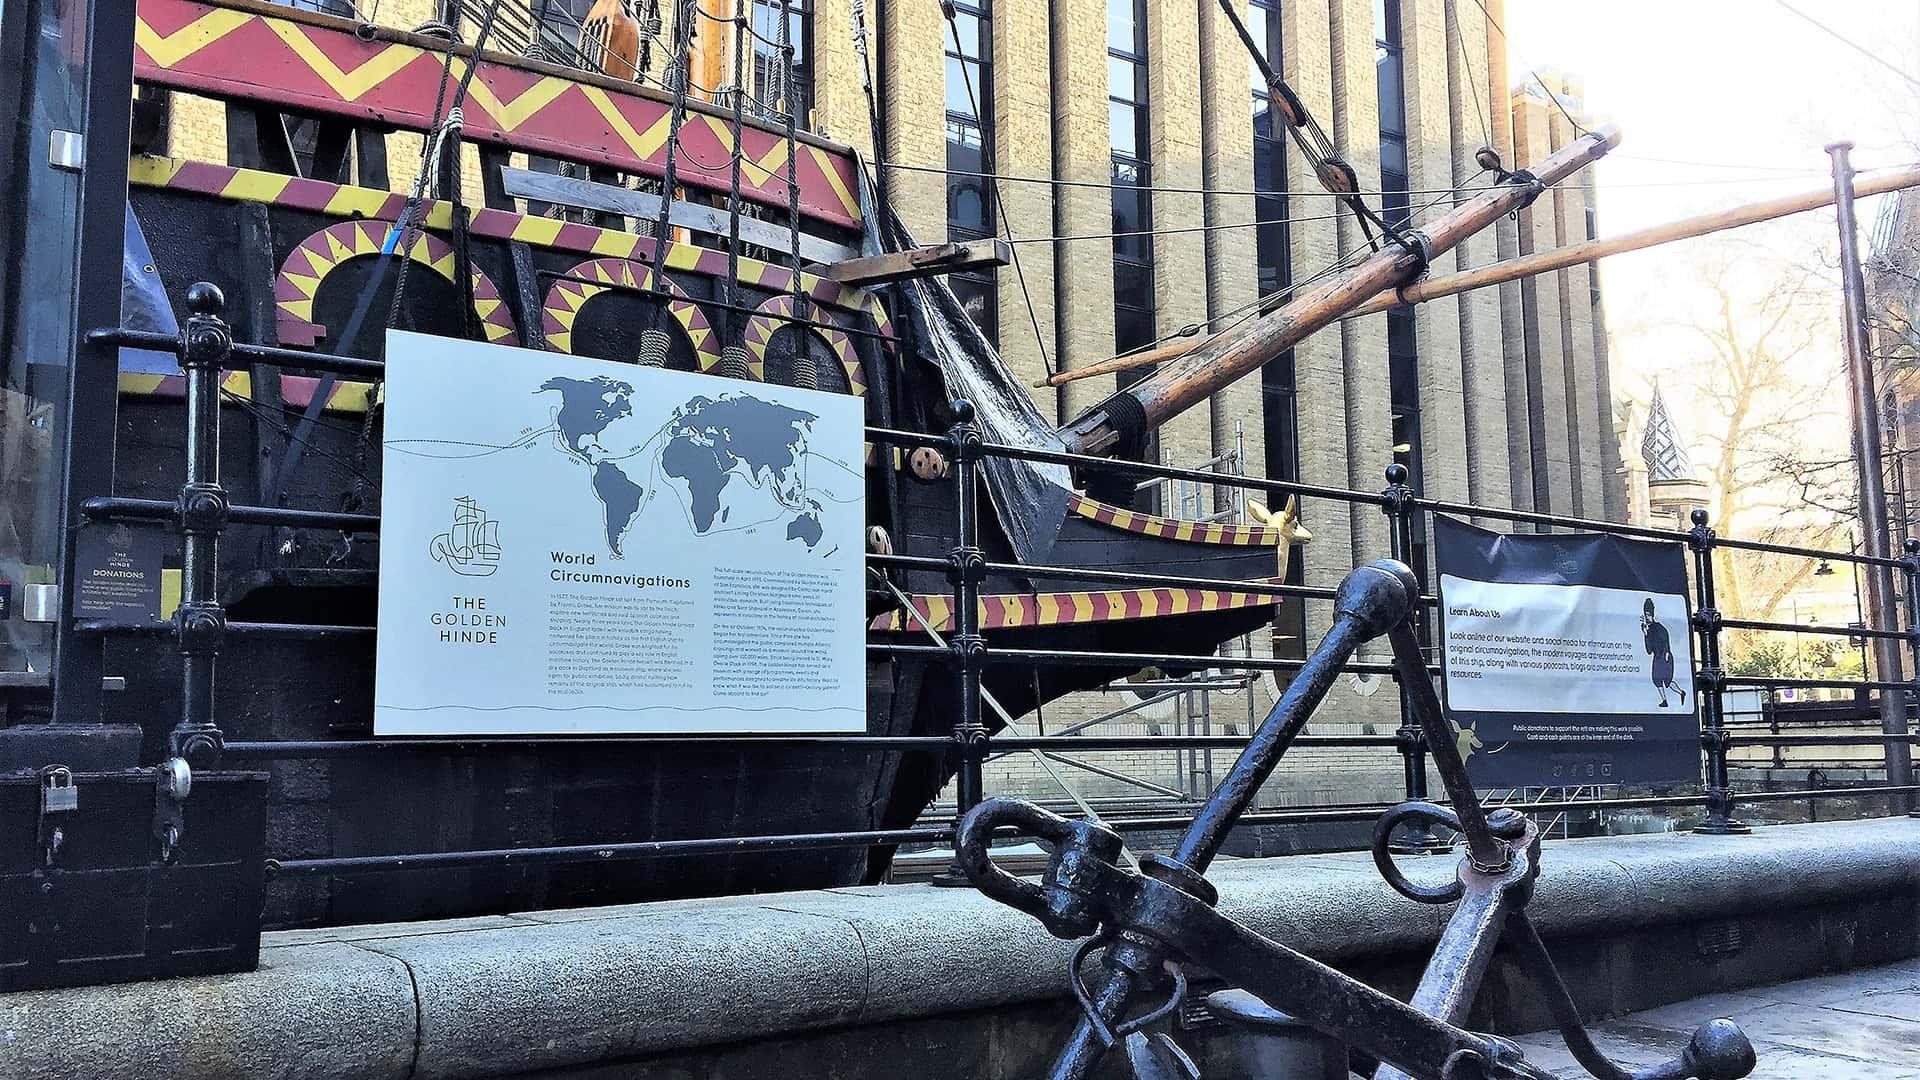 The Golden Hinde – London Virtual Tour